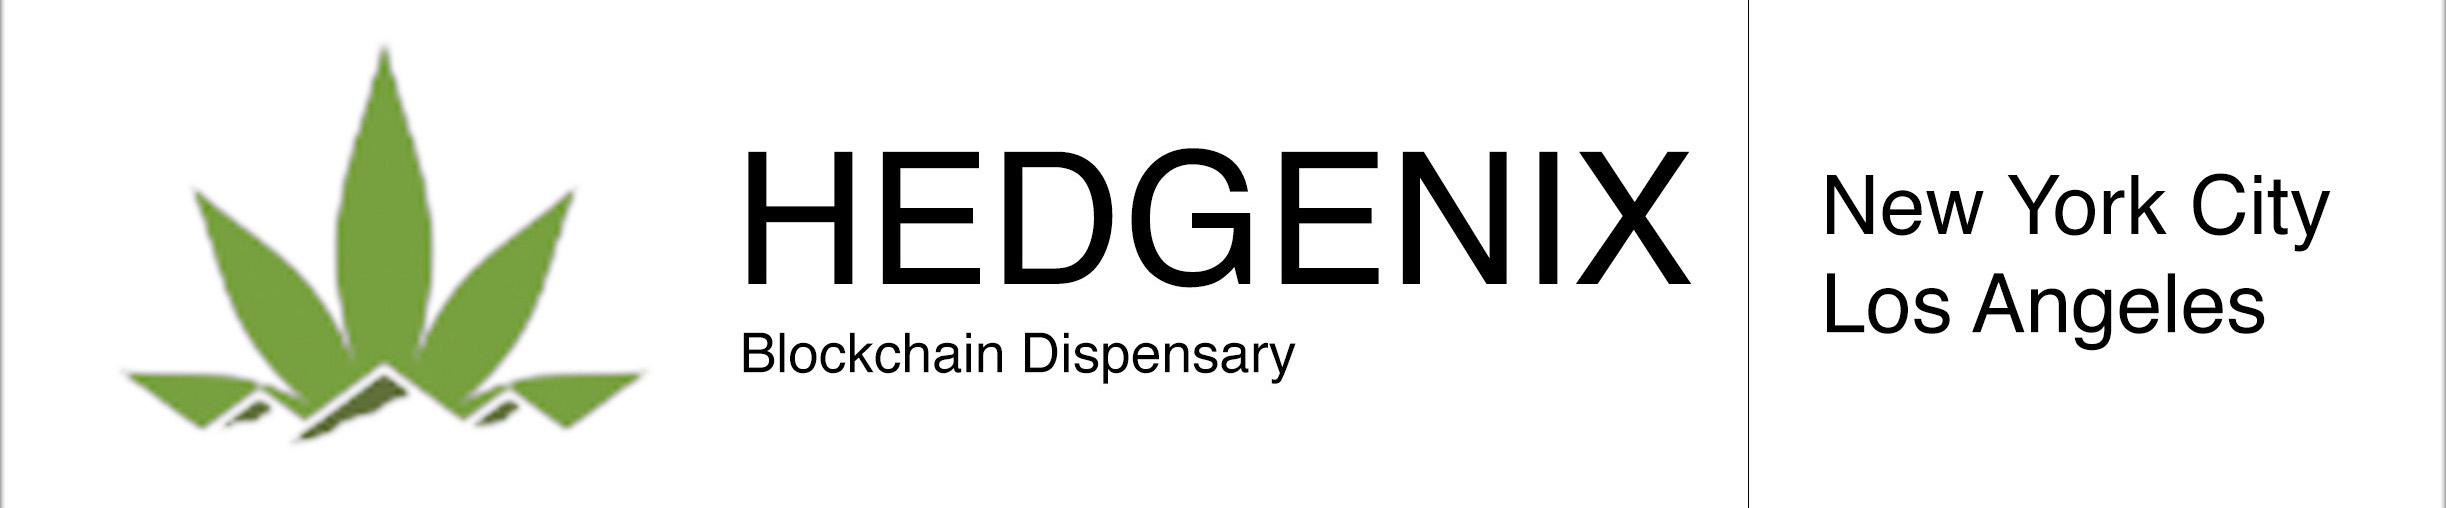 Hedgenix